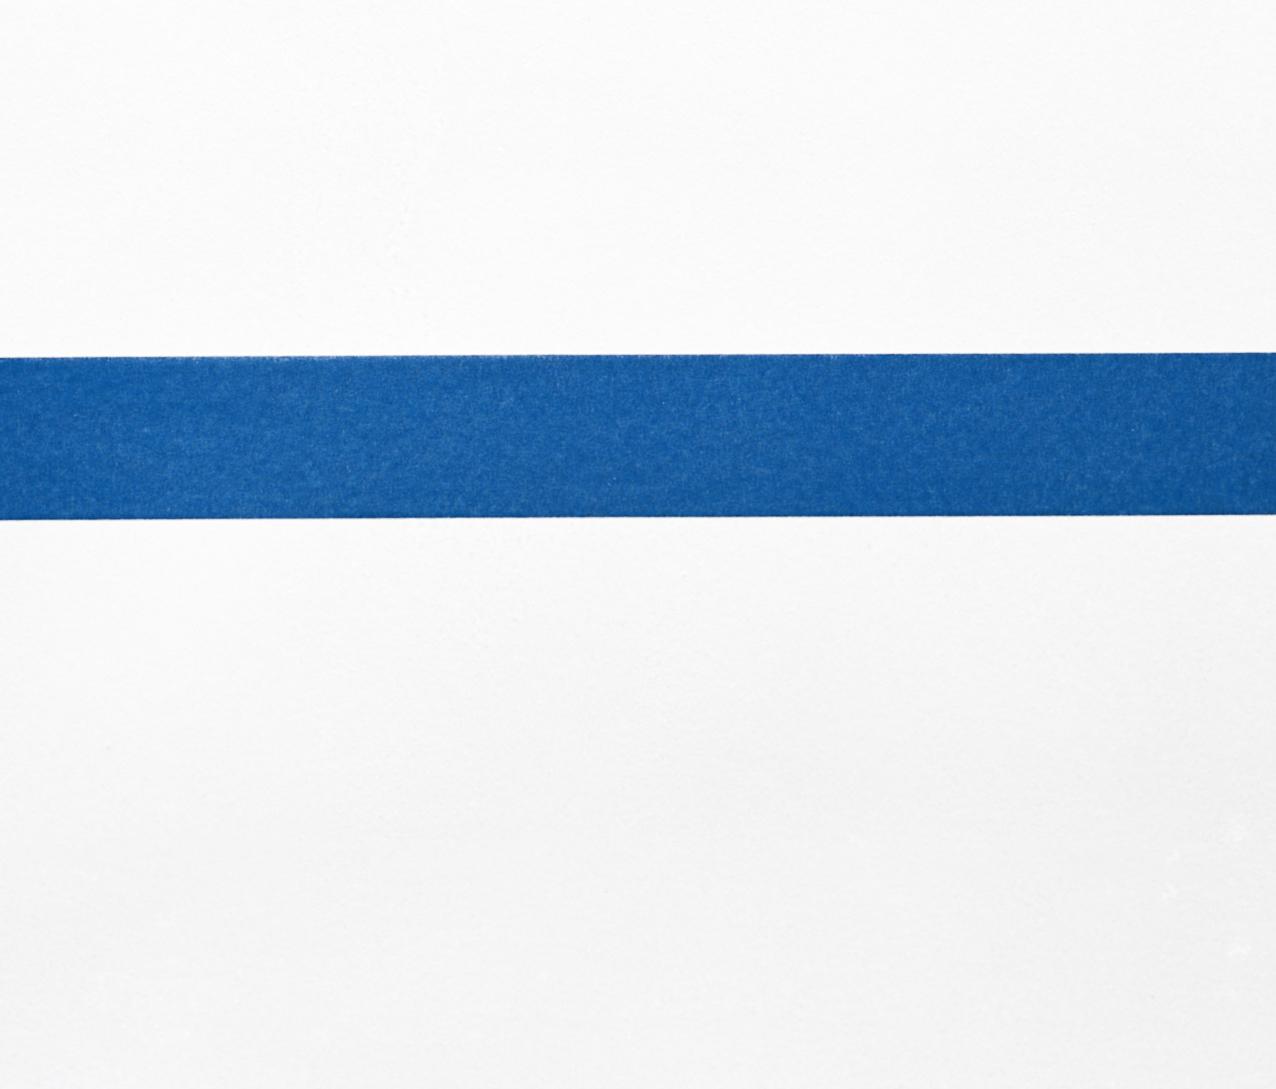 blues-2.jpg